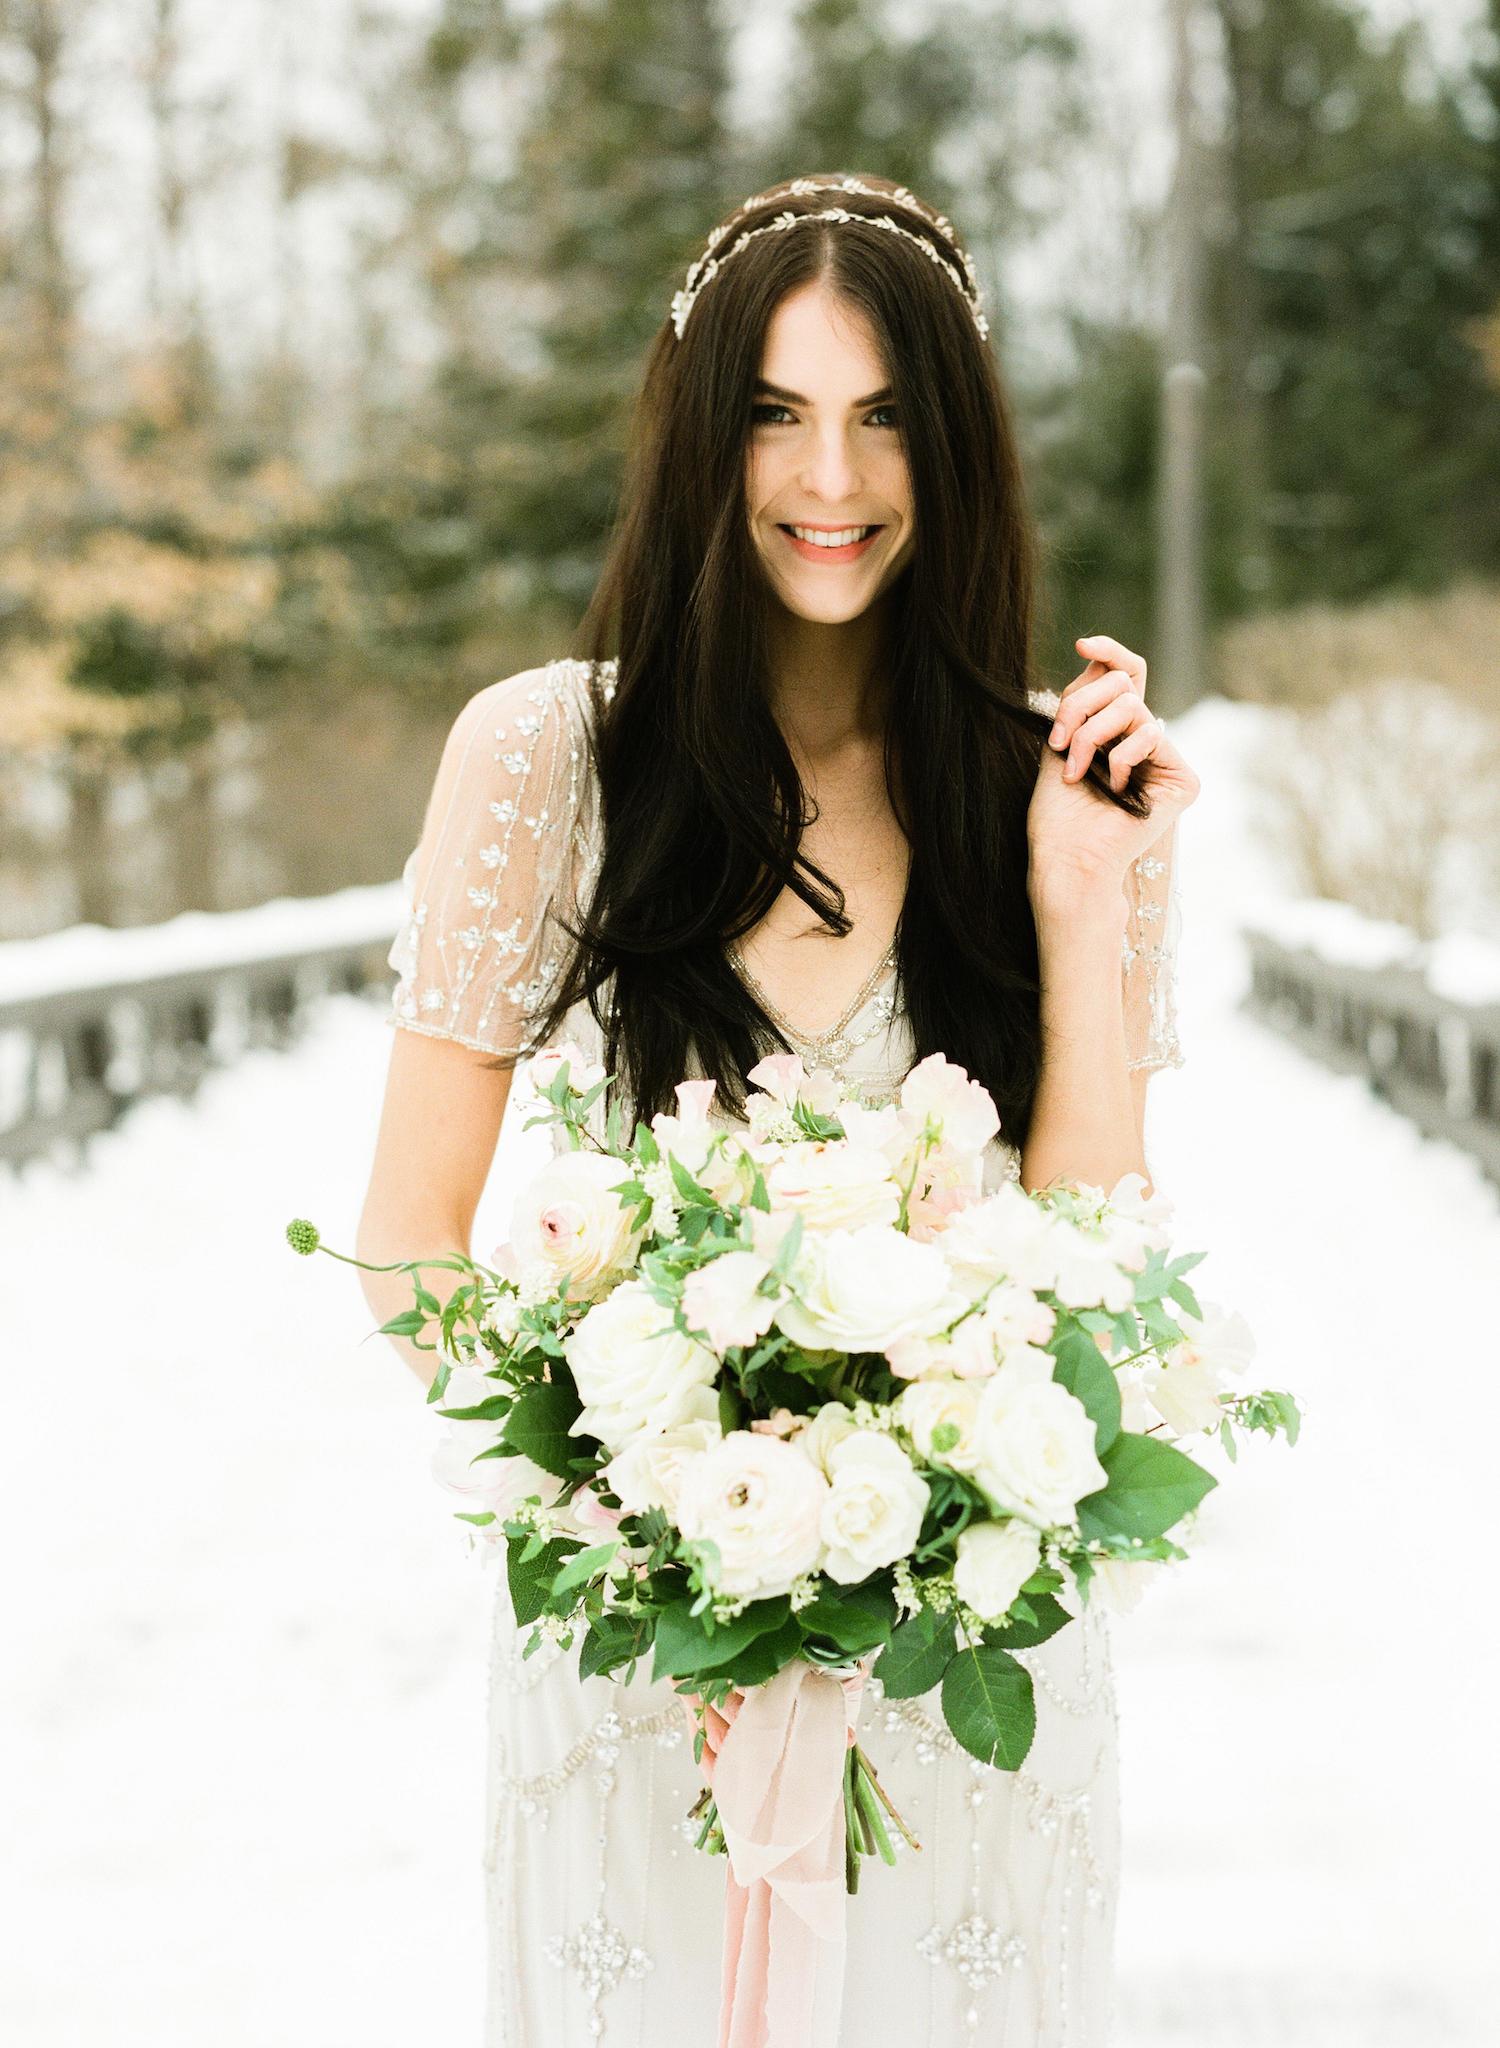 Winter Editorial-JennyPackham-LindsayMaddenPhotography-23 copy.jpg